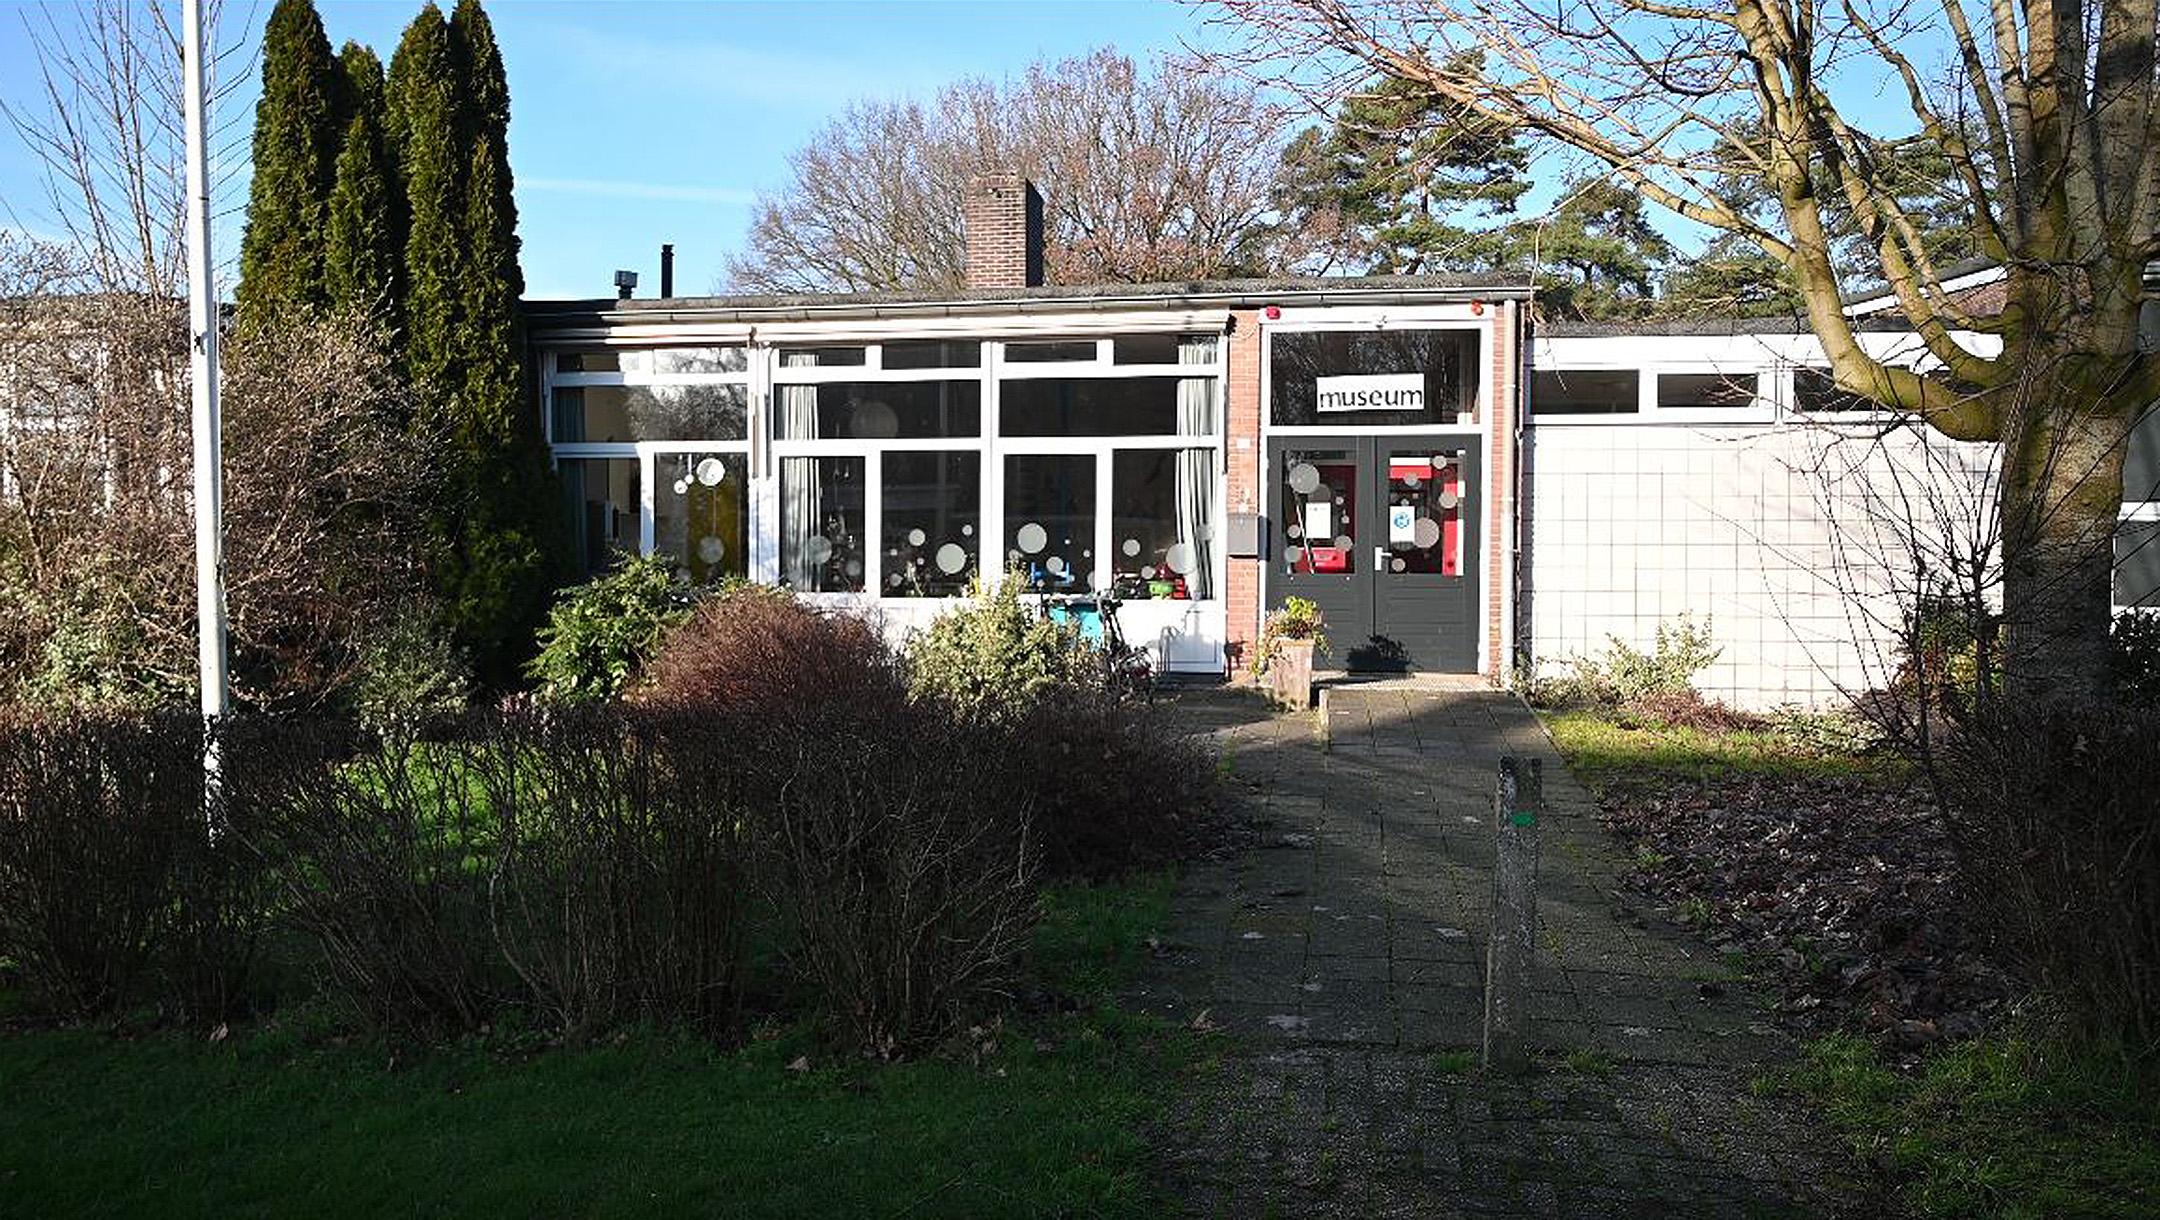 The building of a former school houses the De Duikelaar museum on the rescue of Jews in Nieuwlande, the Netherlands. (Cnaan Liphshiz)